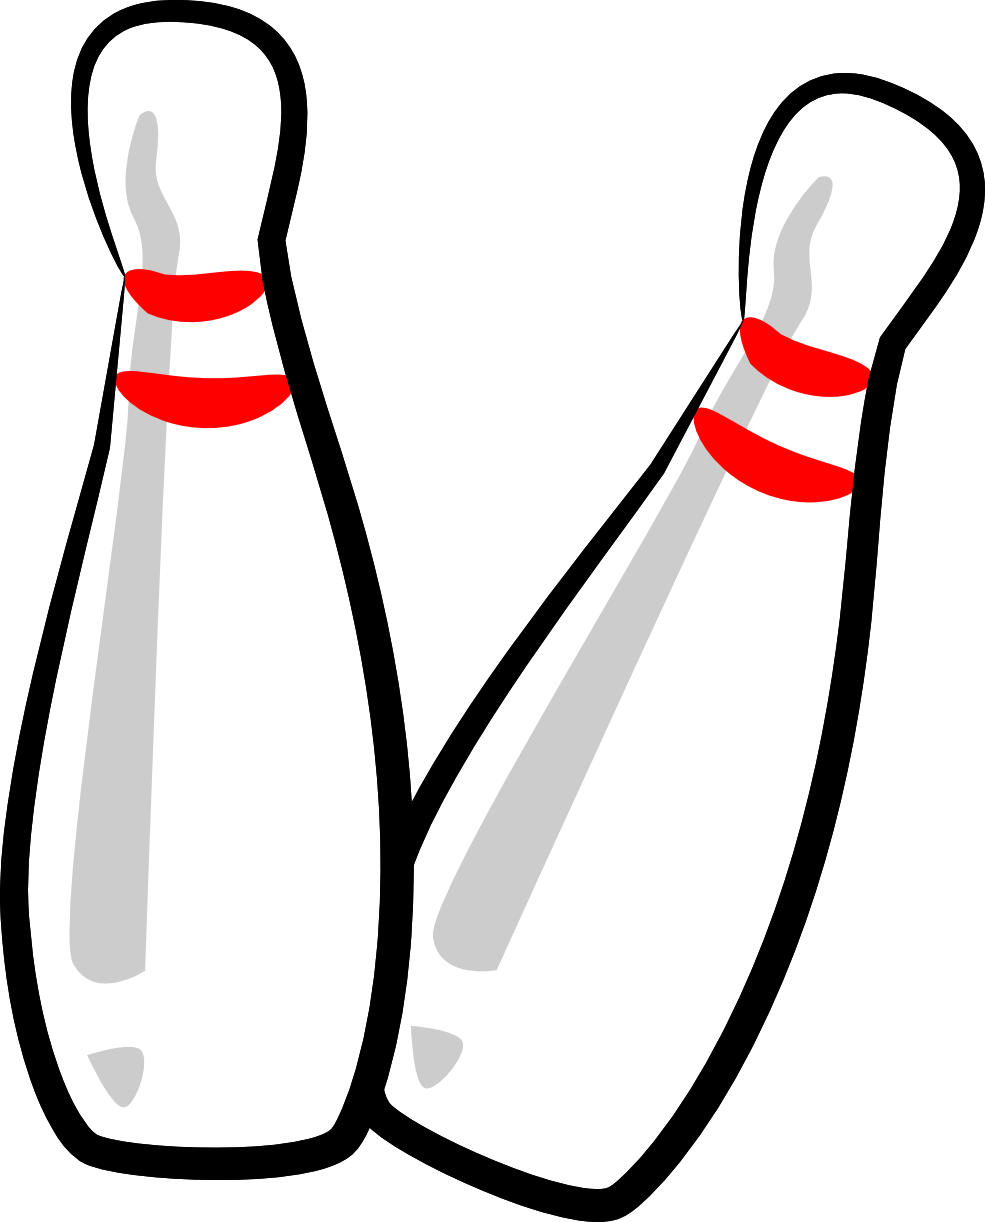 Bowling ball bowling pin clipart